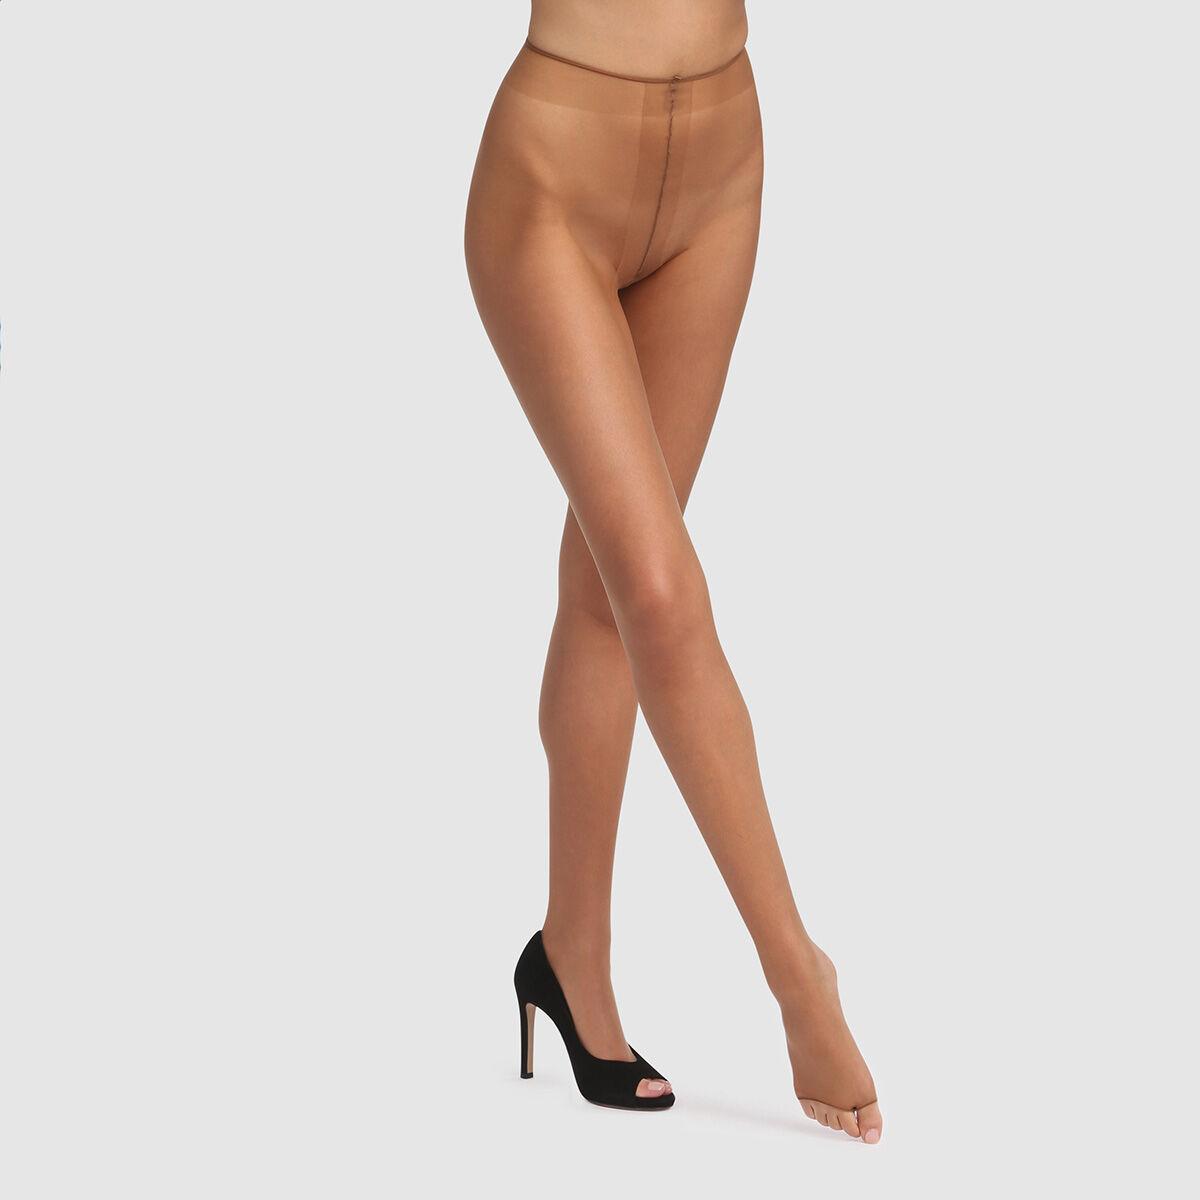 Dim Hosiery Womens Dim Teint De Soleil Even and Sunkissed Tone Pantyhose